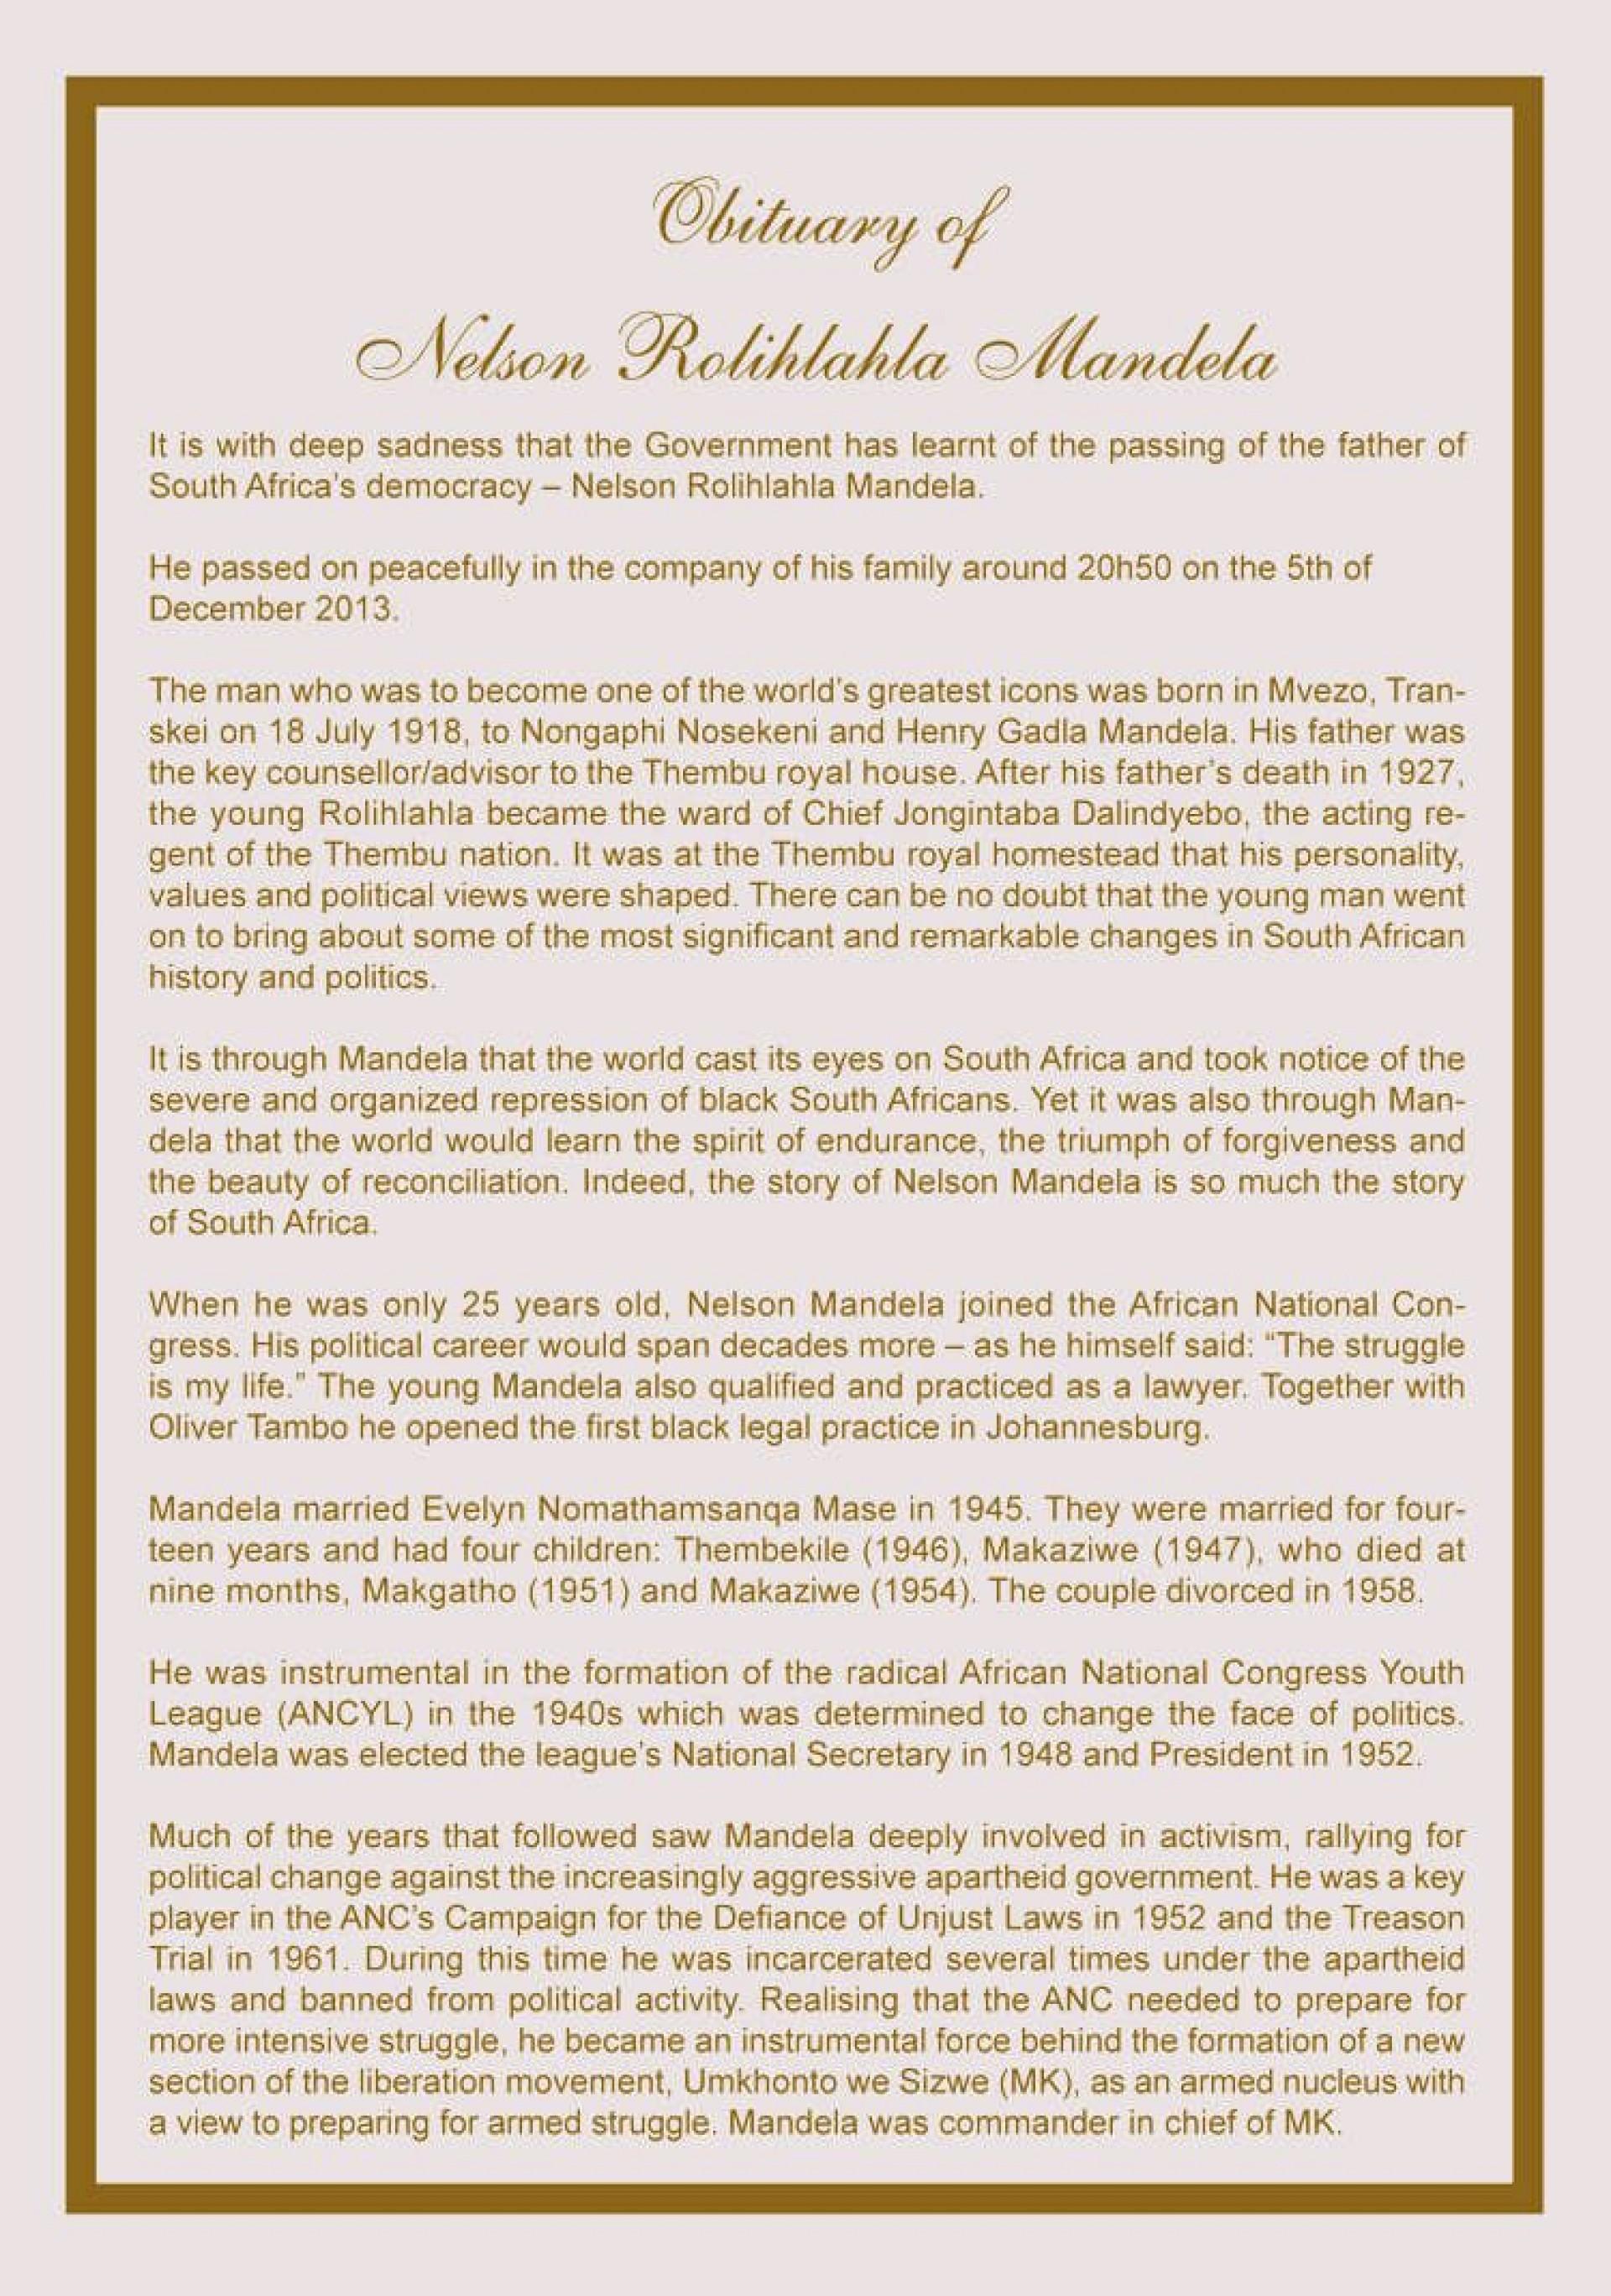 003 Impressive Template For Funeral Program On Word Highest Quality  2010 Free Sample Wording1920